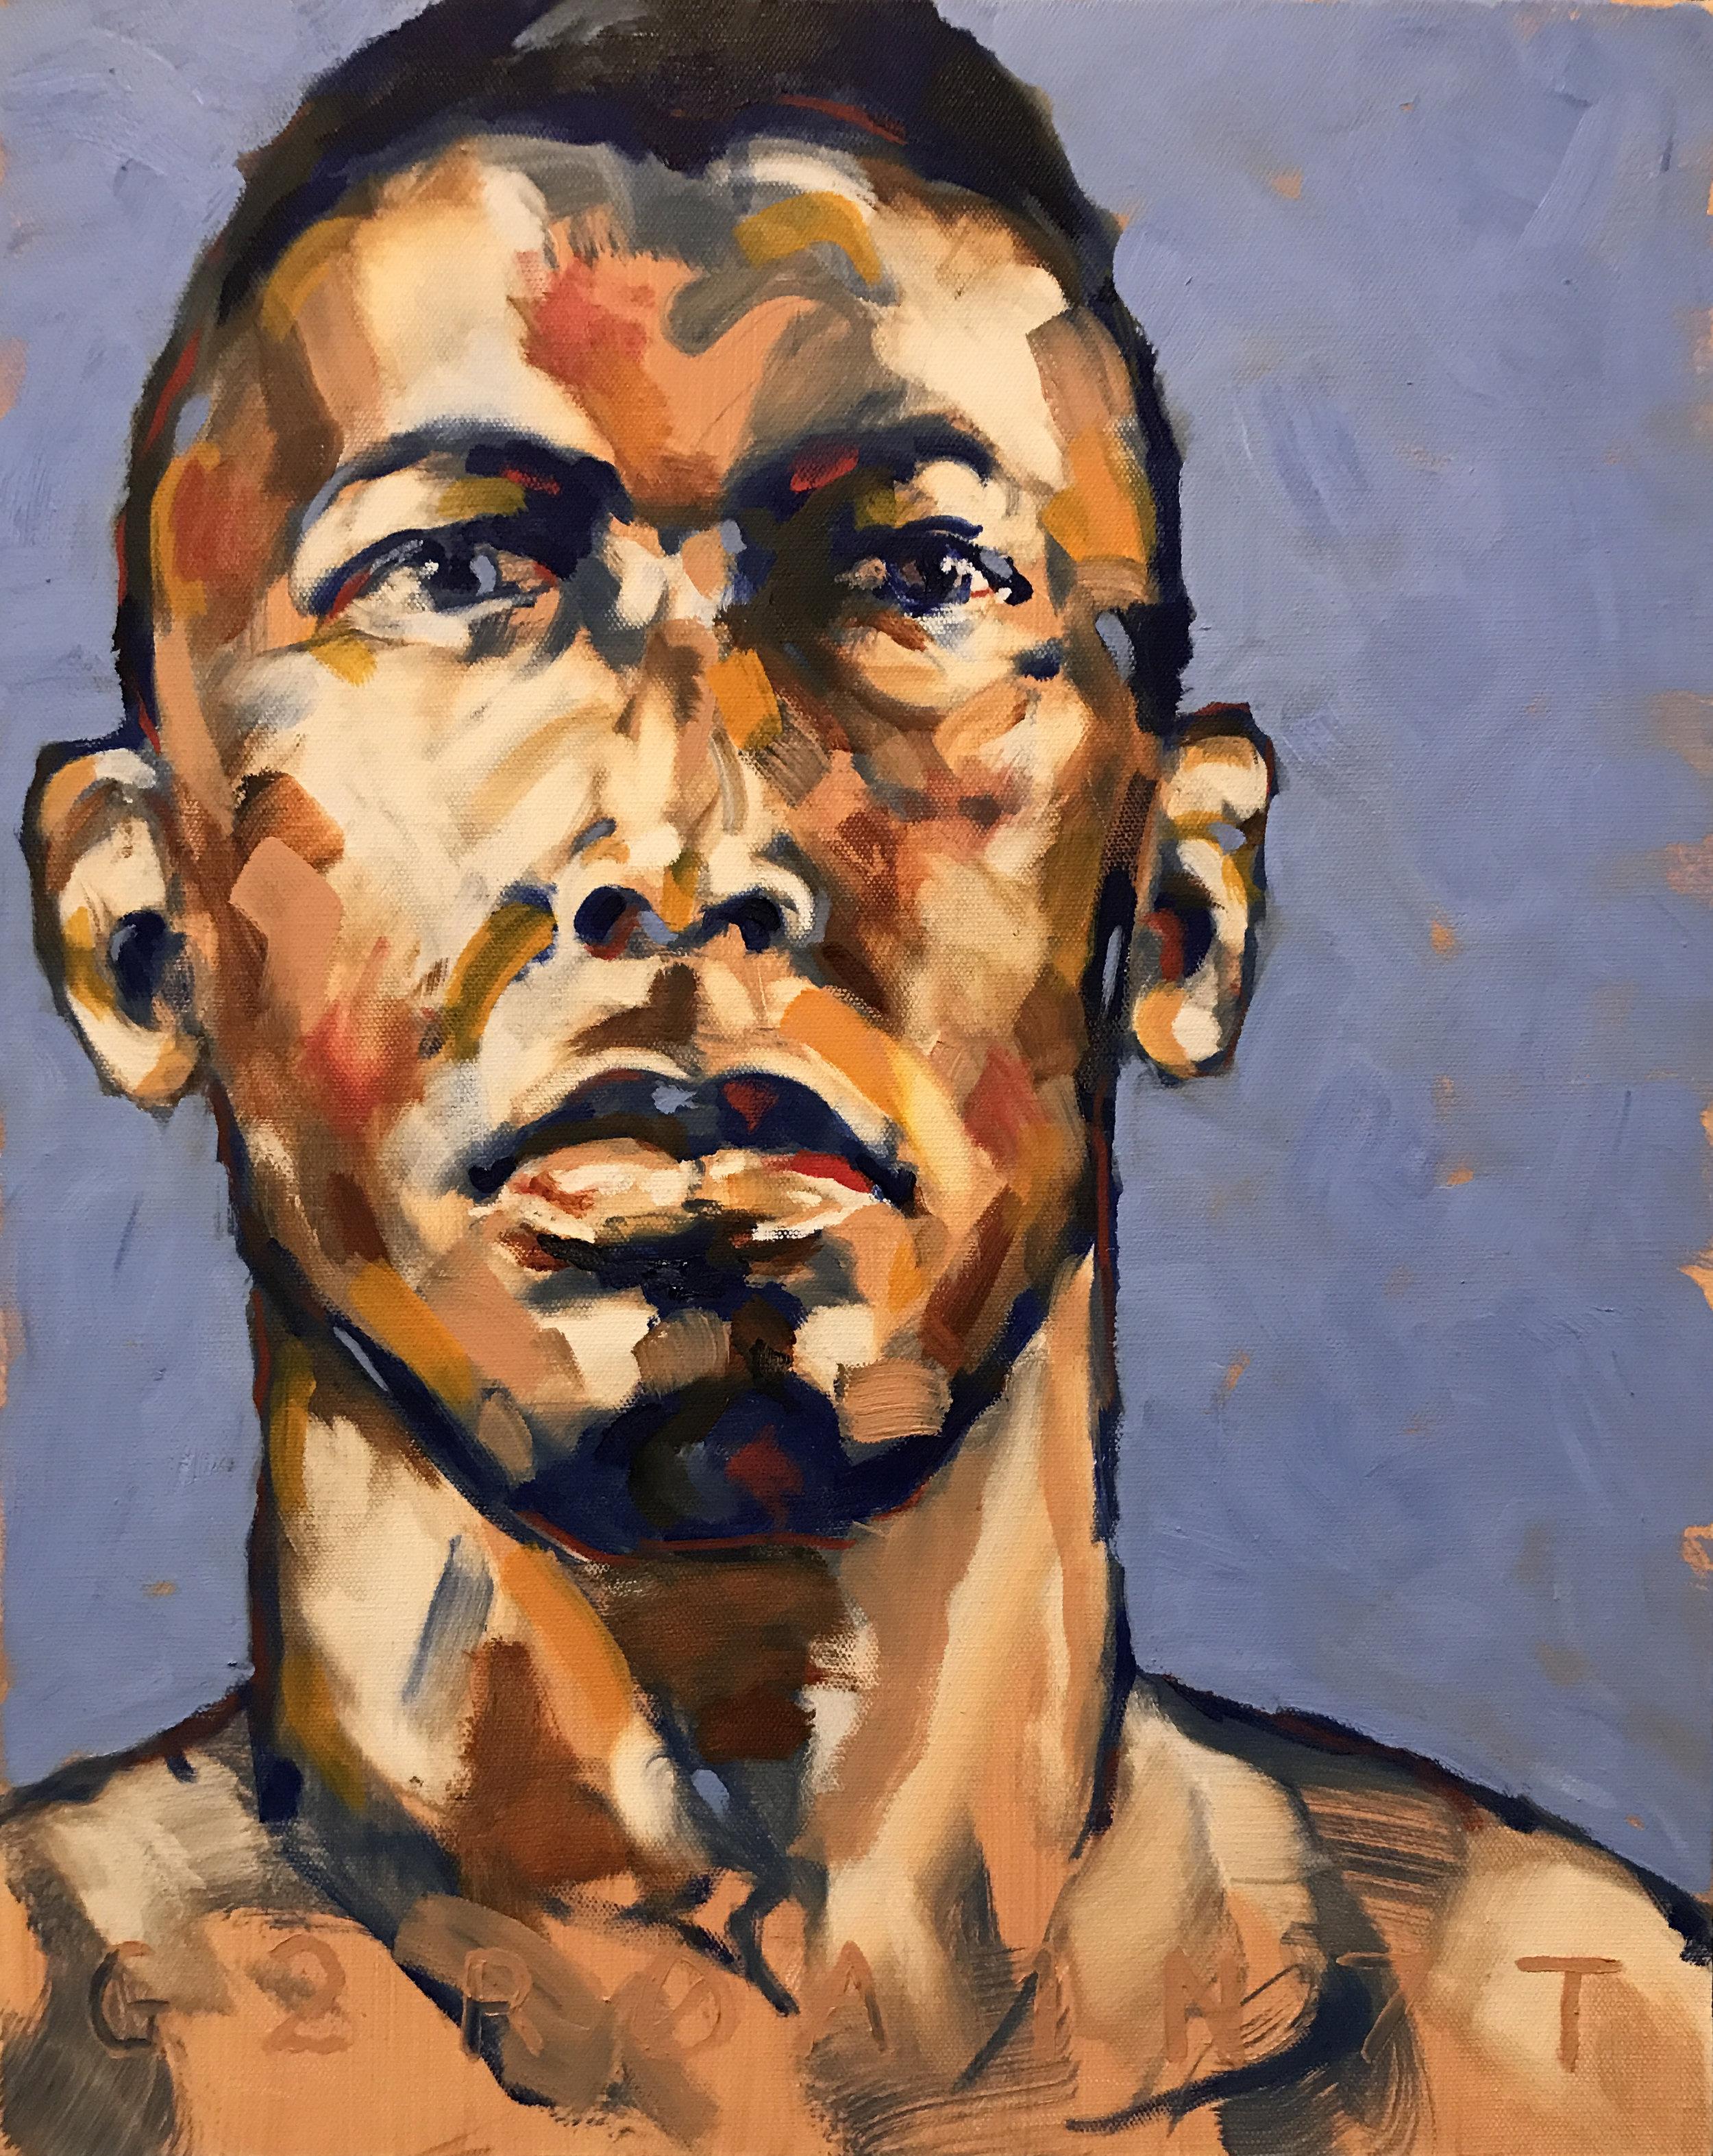 Dorian Oil on Canvas 16x20  $700